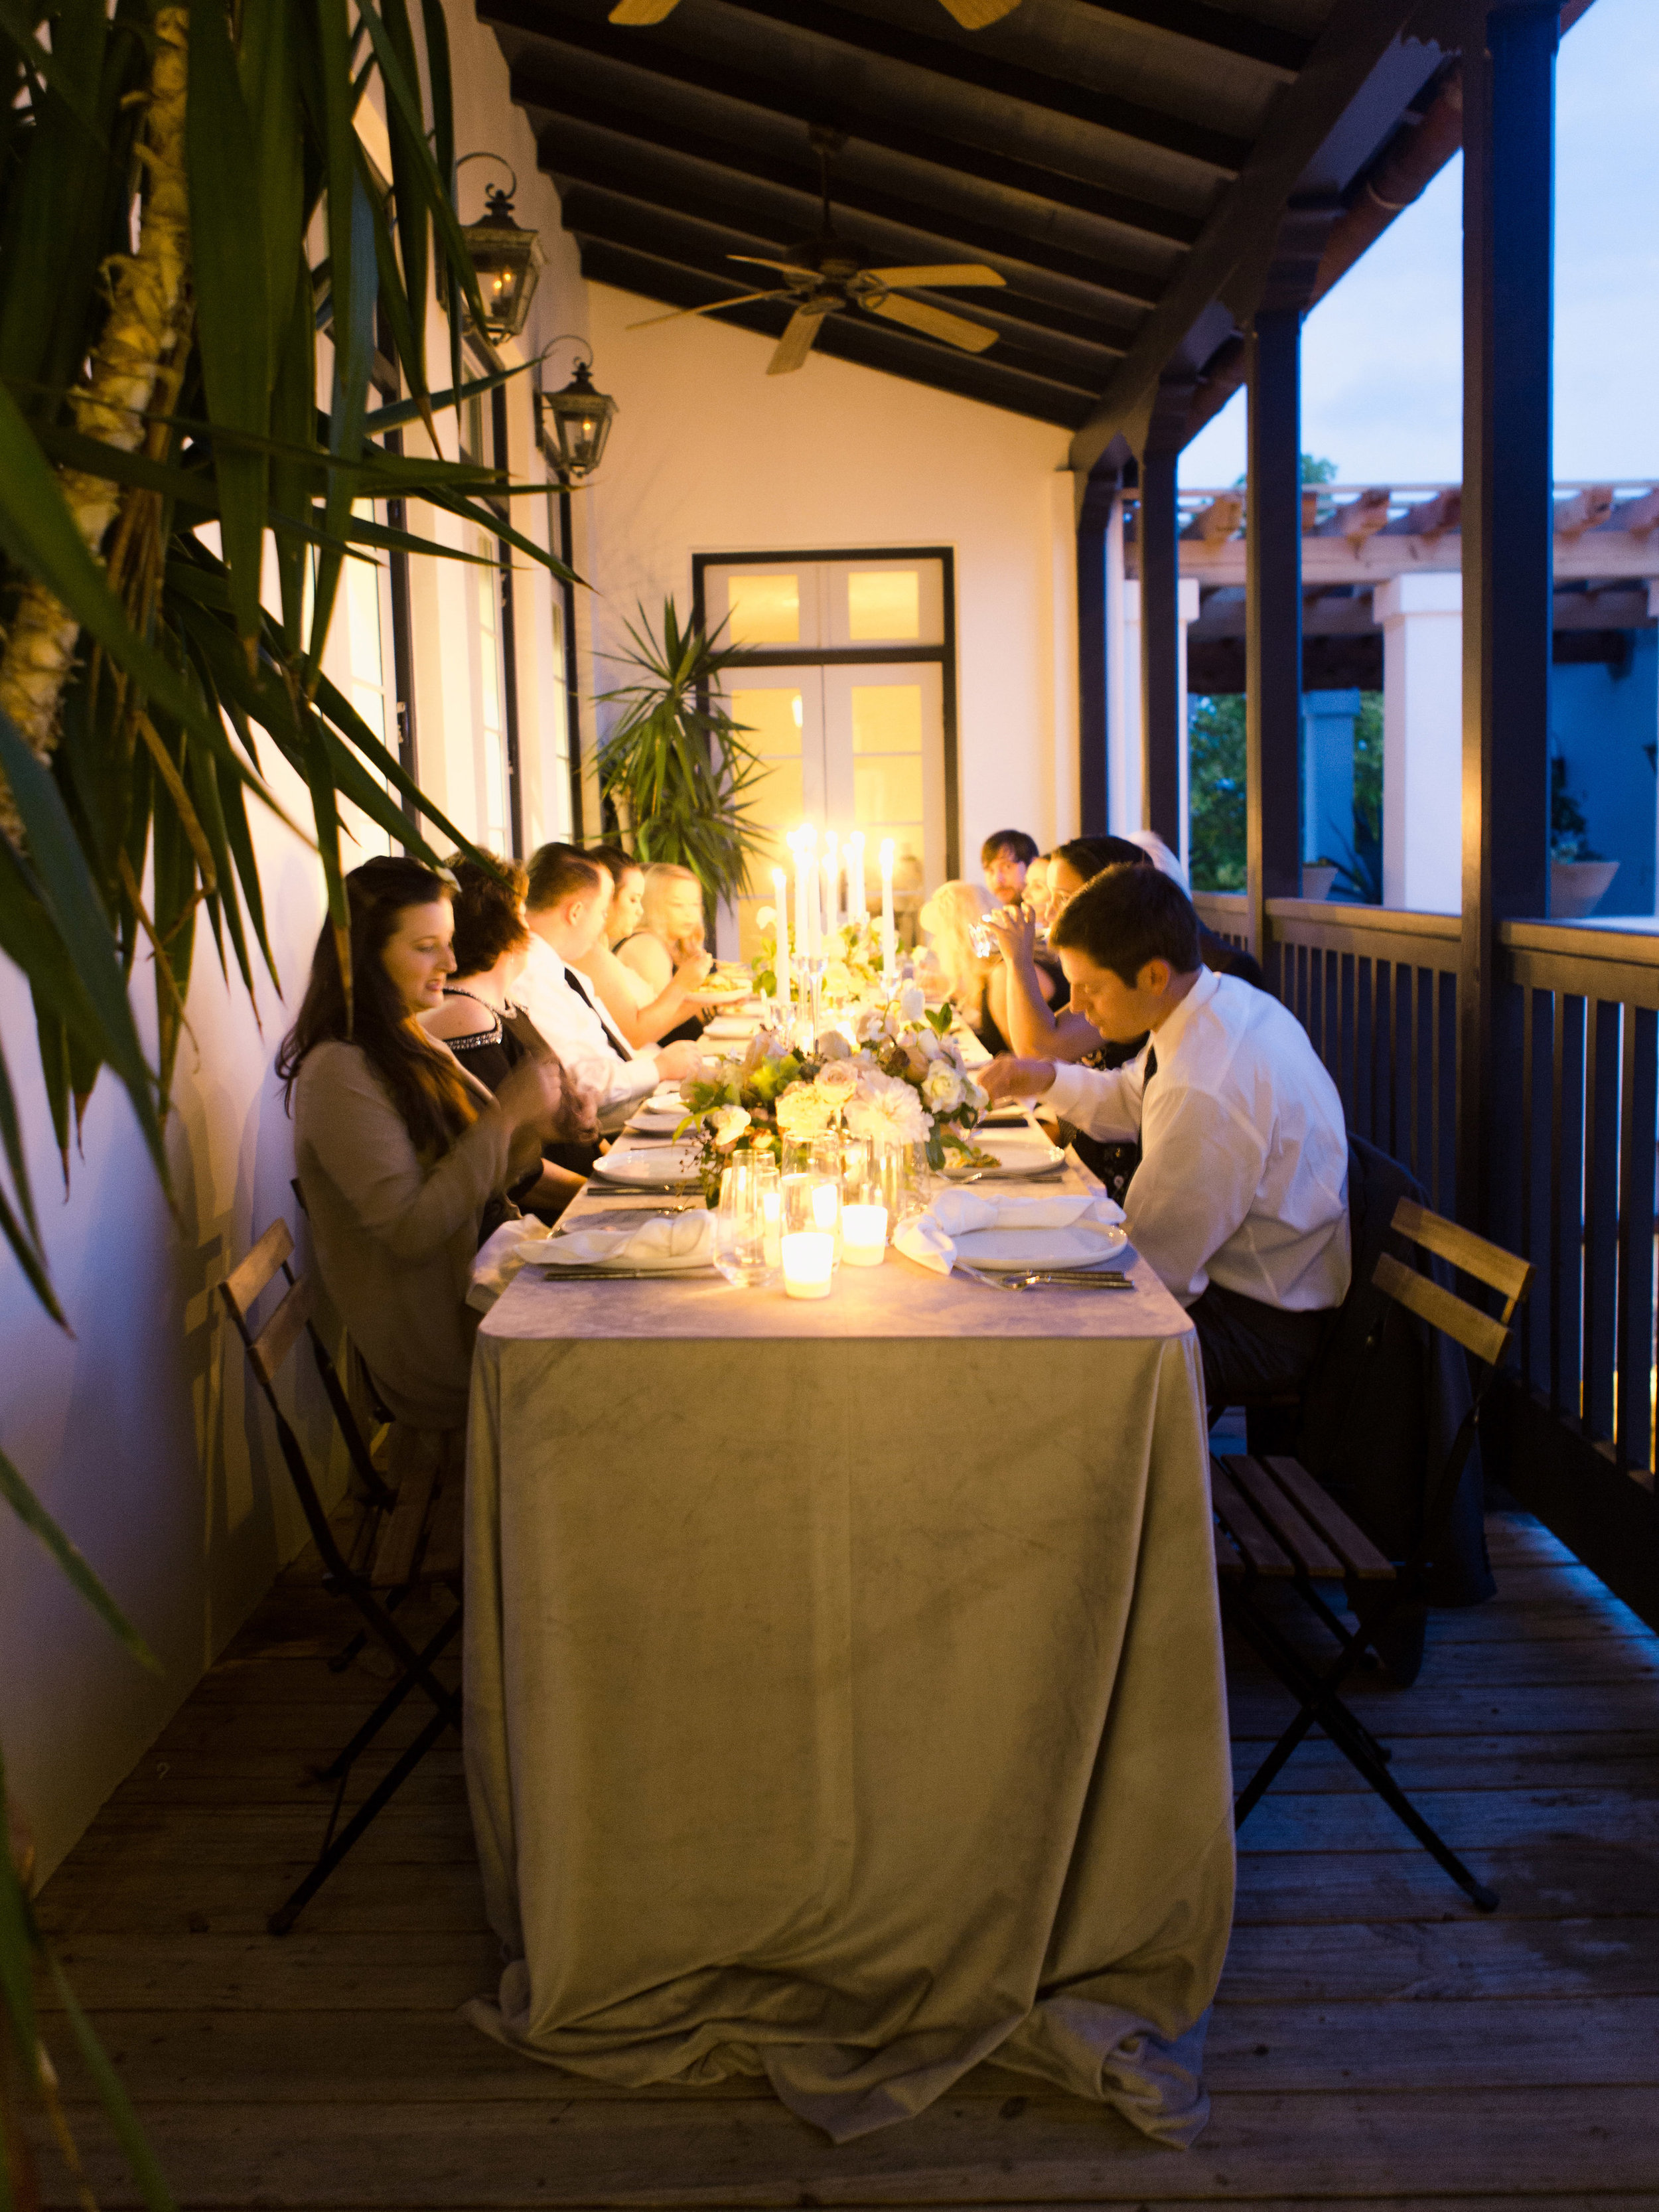 jessica-zimmerman-events-wedding-intimate-reception-florida.jpg